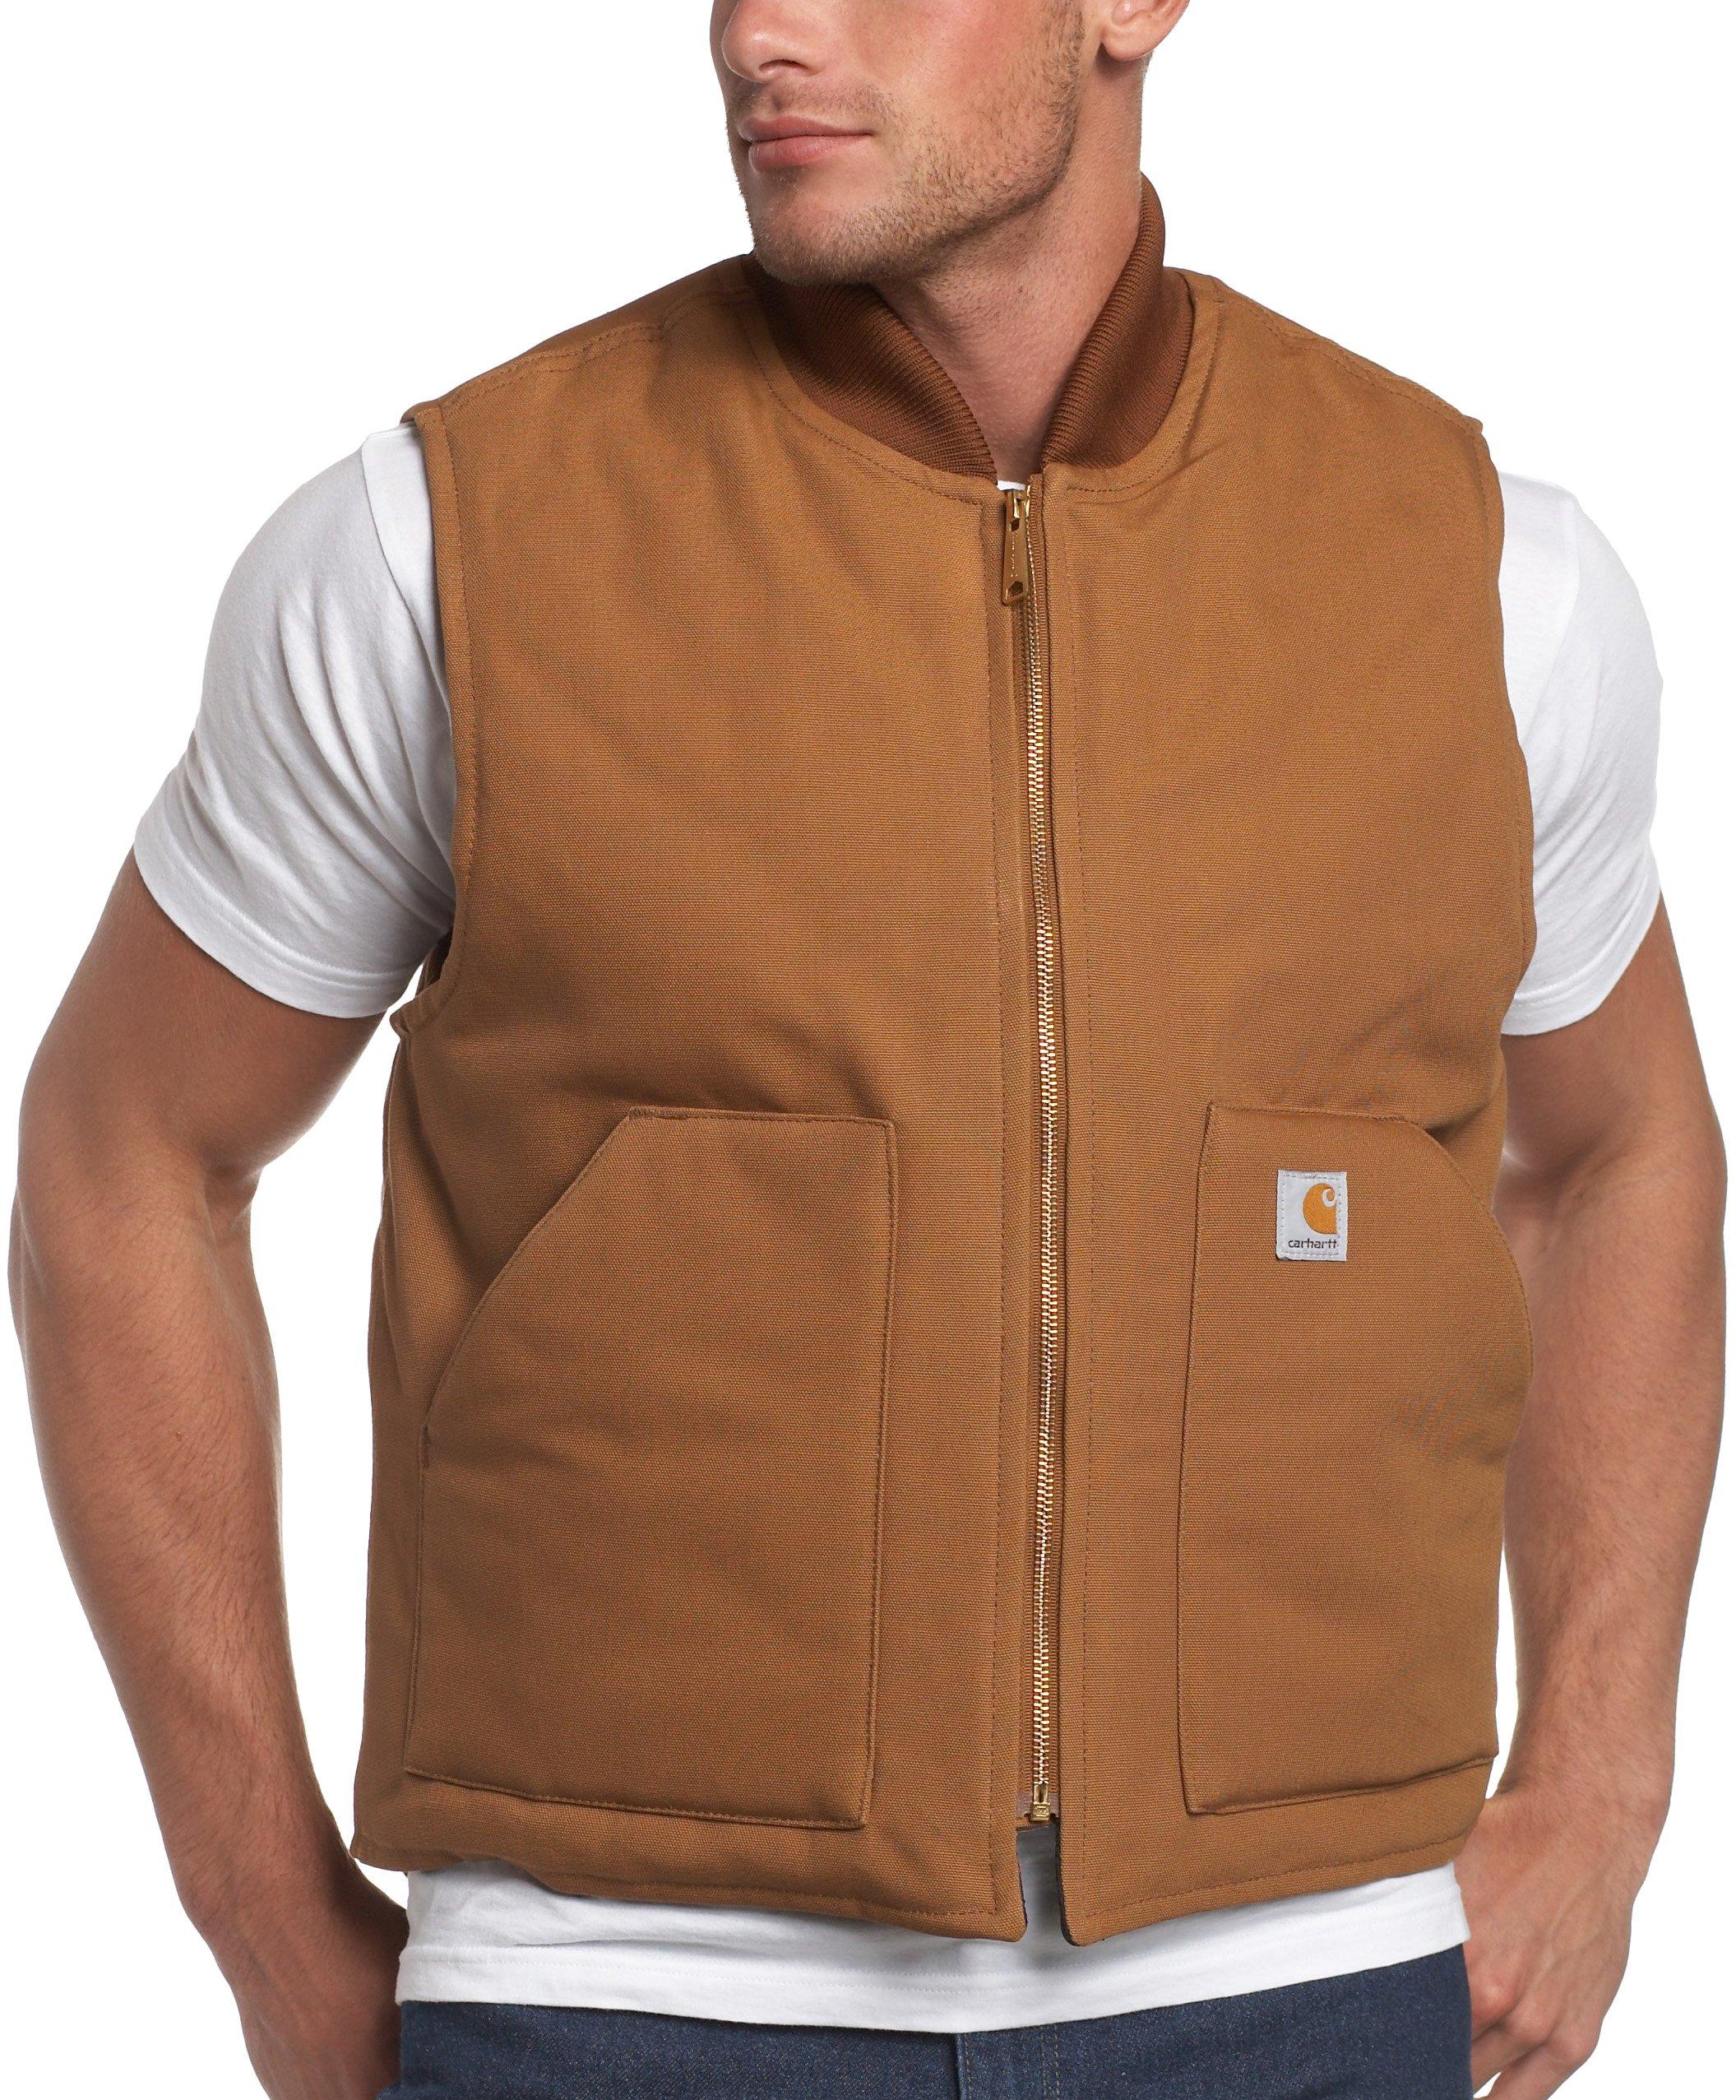 Carhartt Men's Duck Vest,Brown,XX-Large by Carhartt